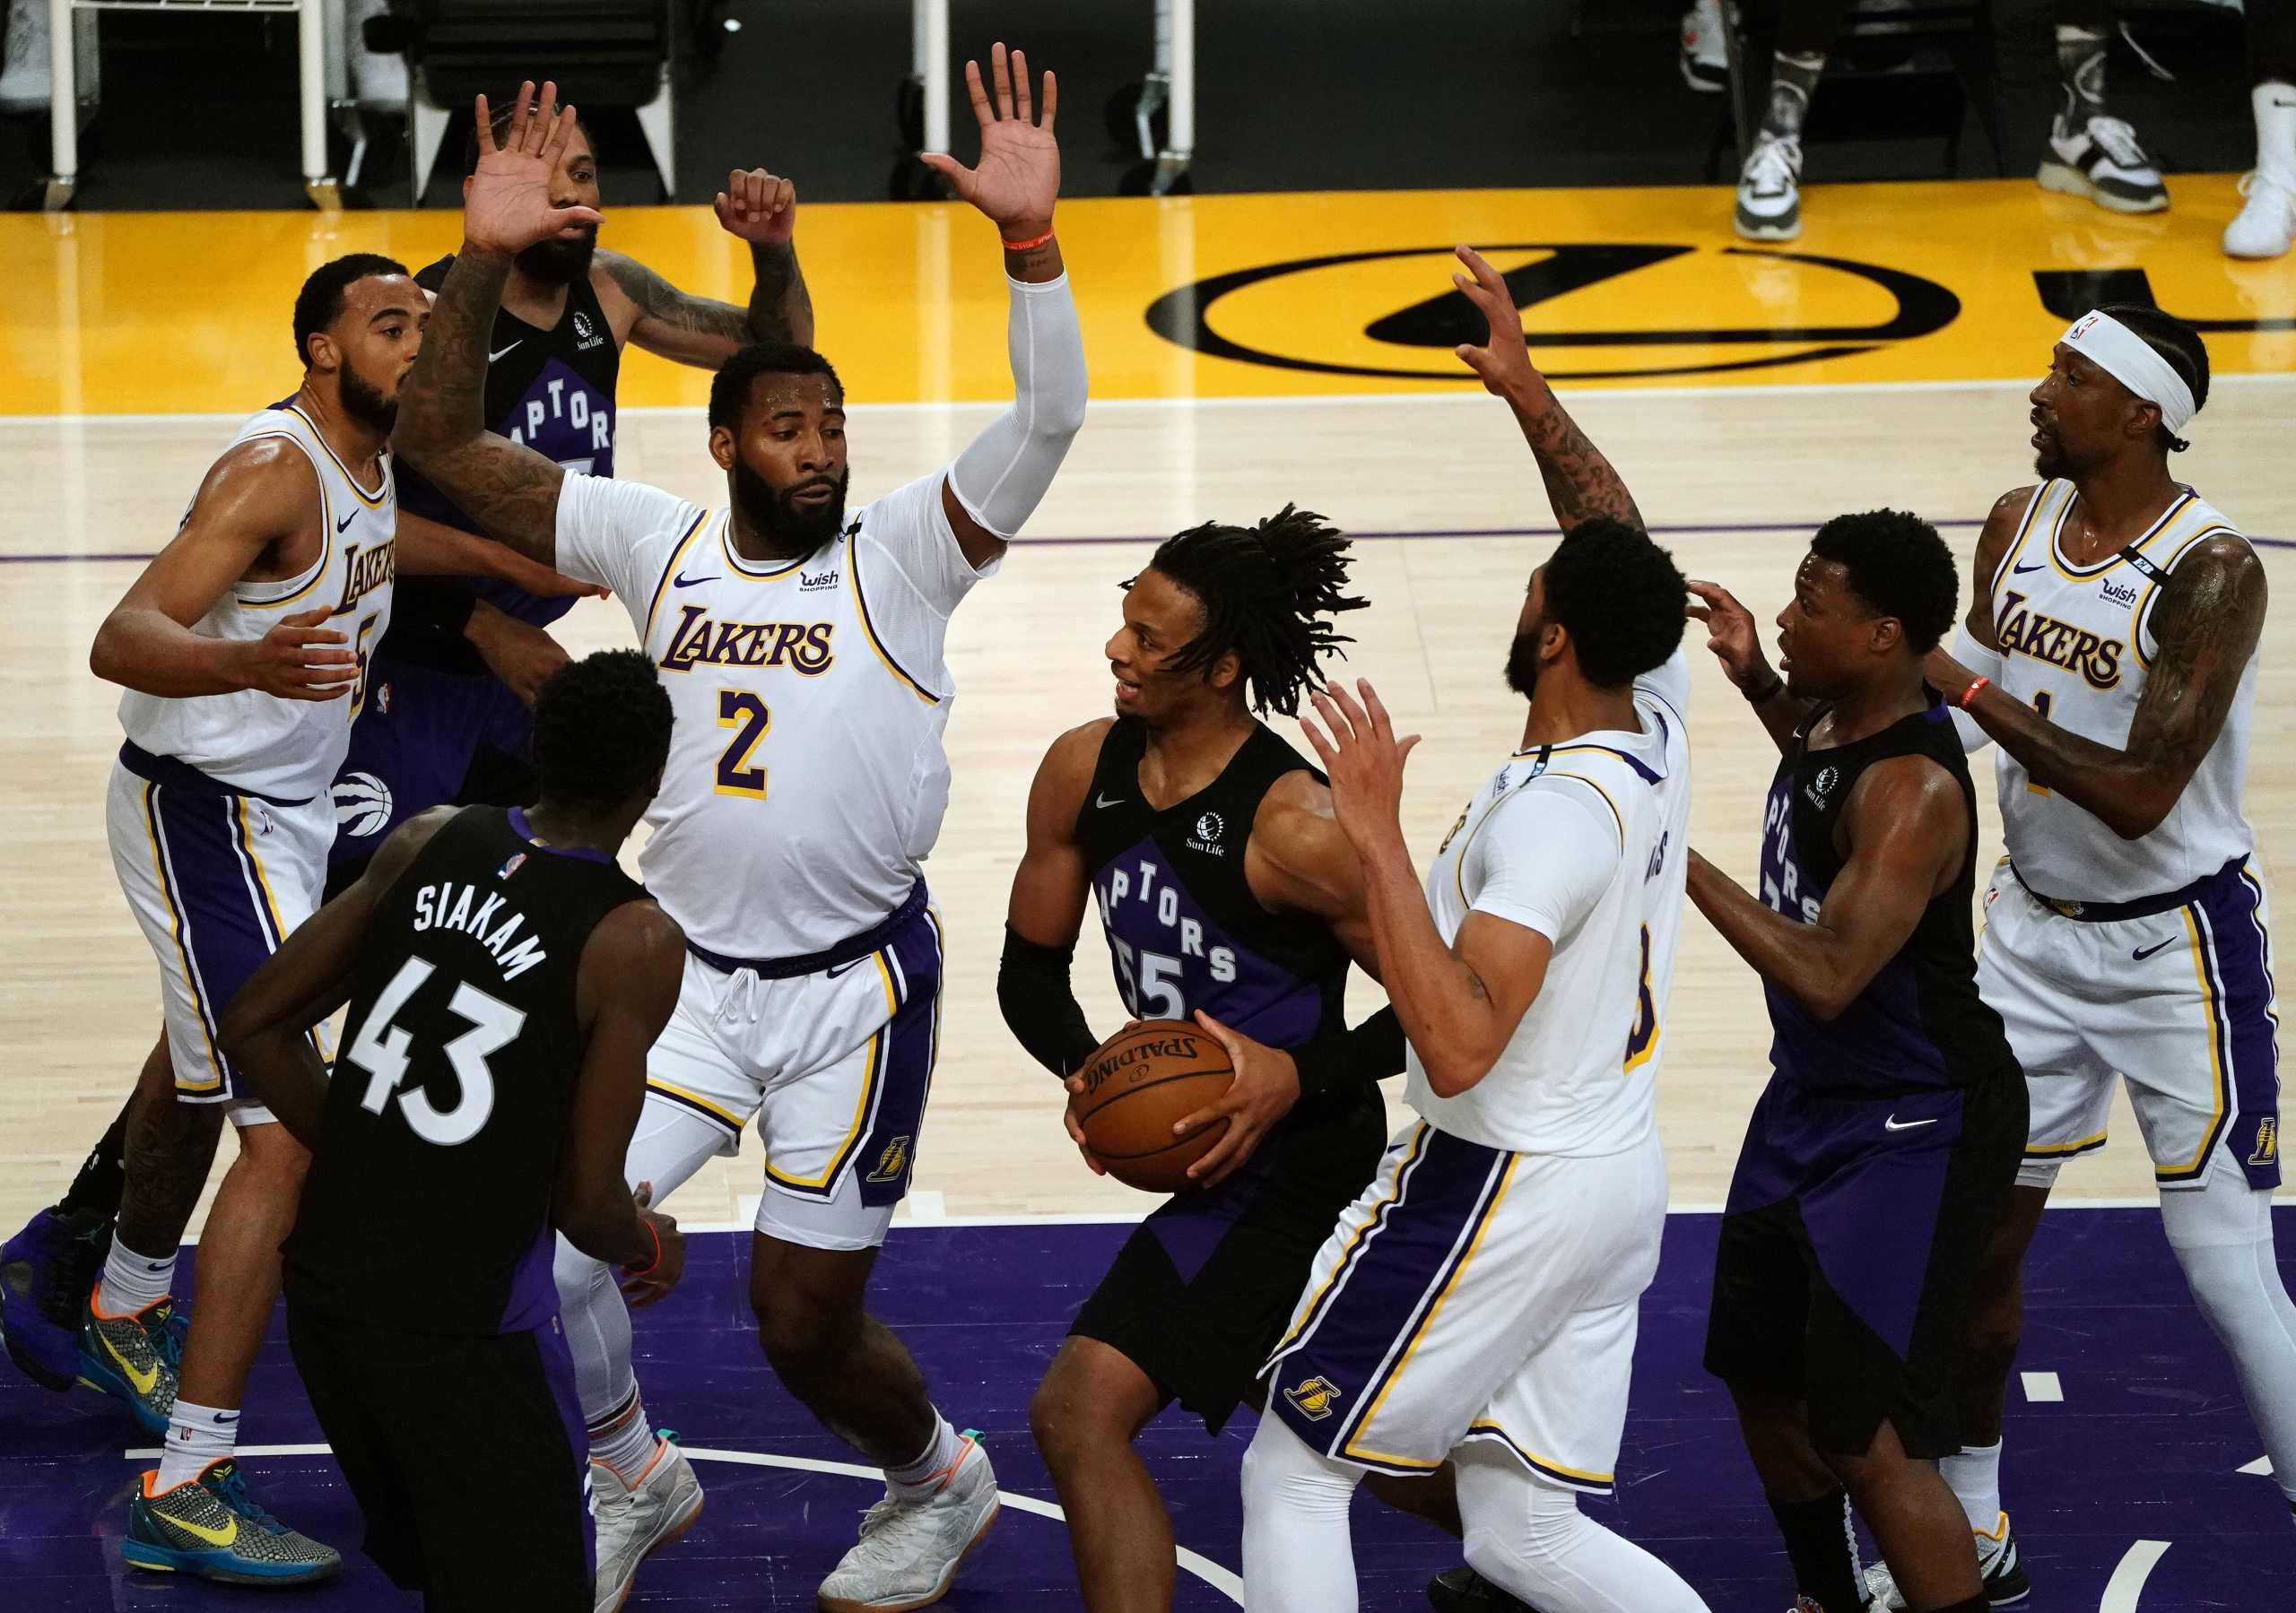 NBA: Νέα «σφαλιάρα» για Λέικερς, σπουδαία νίκη για Μπλέιζερς στη Βοστώνη